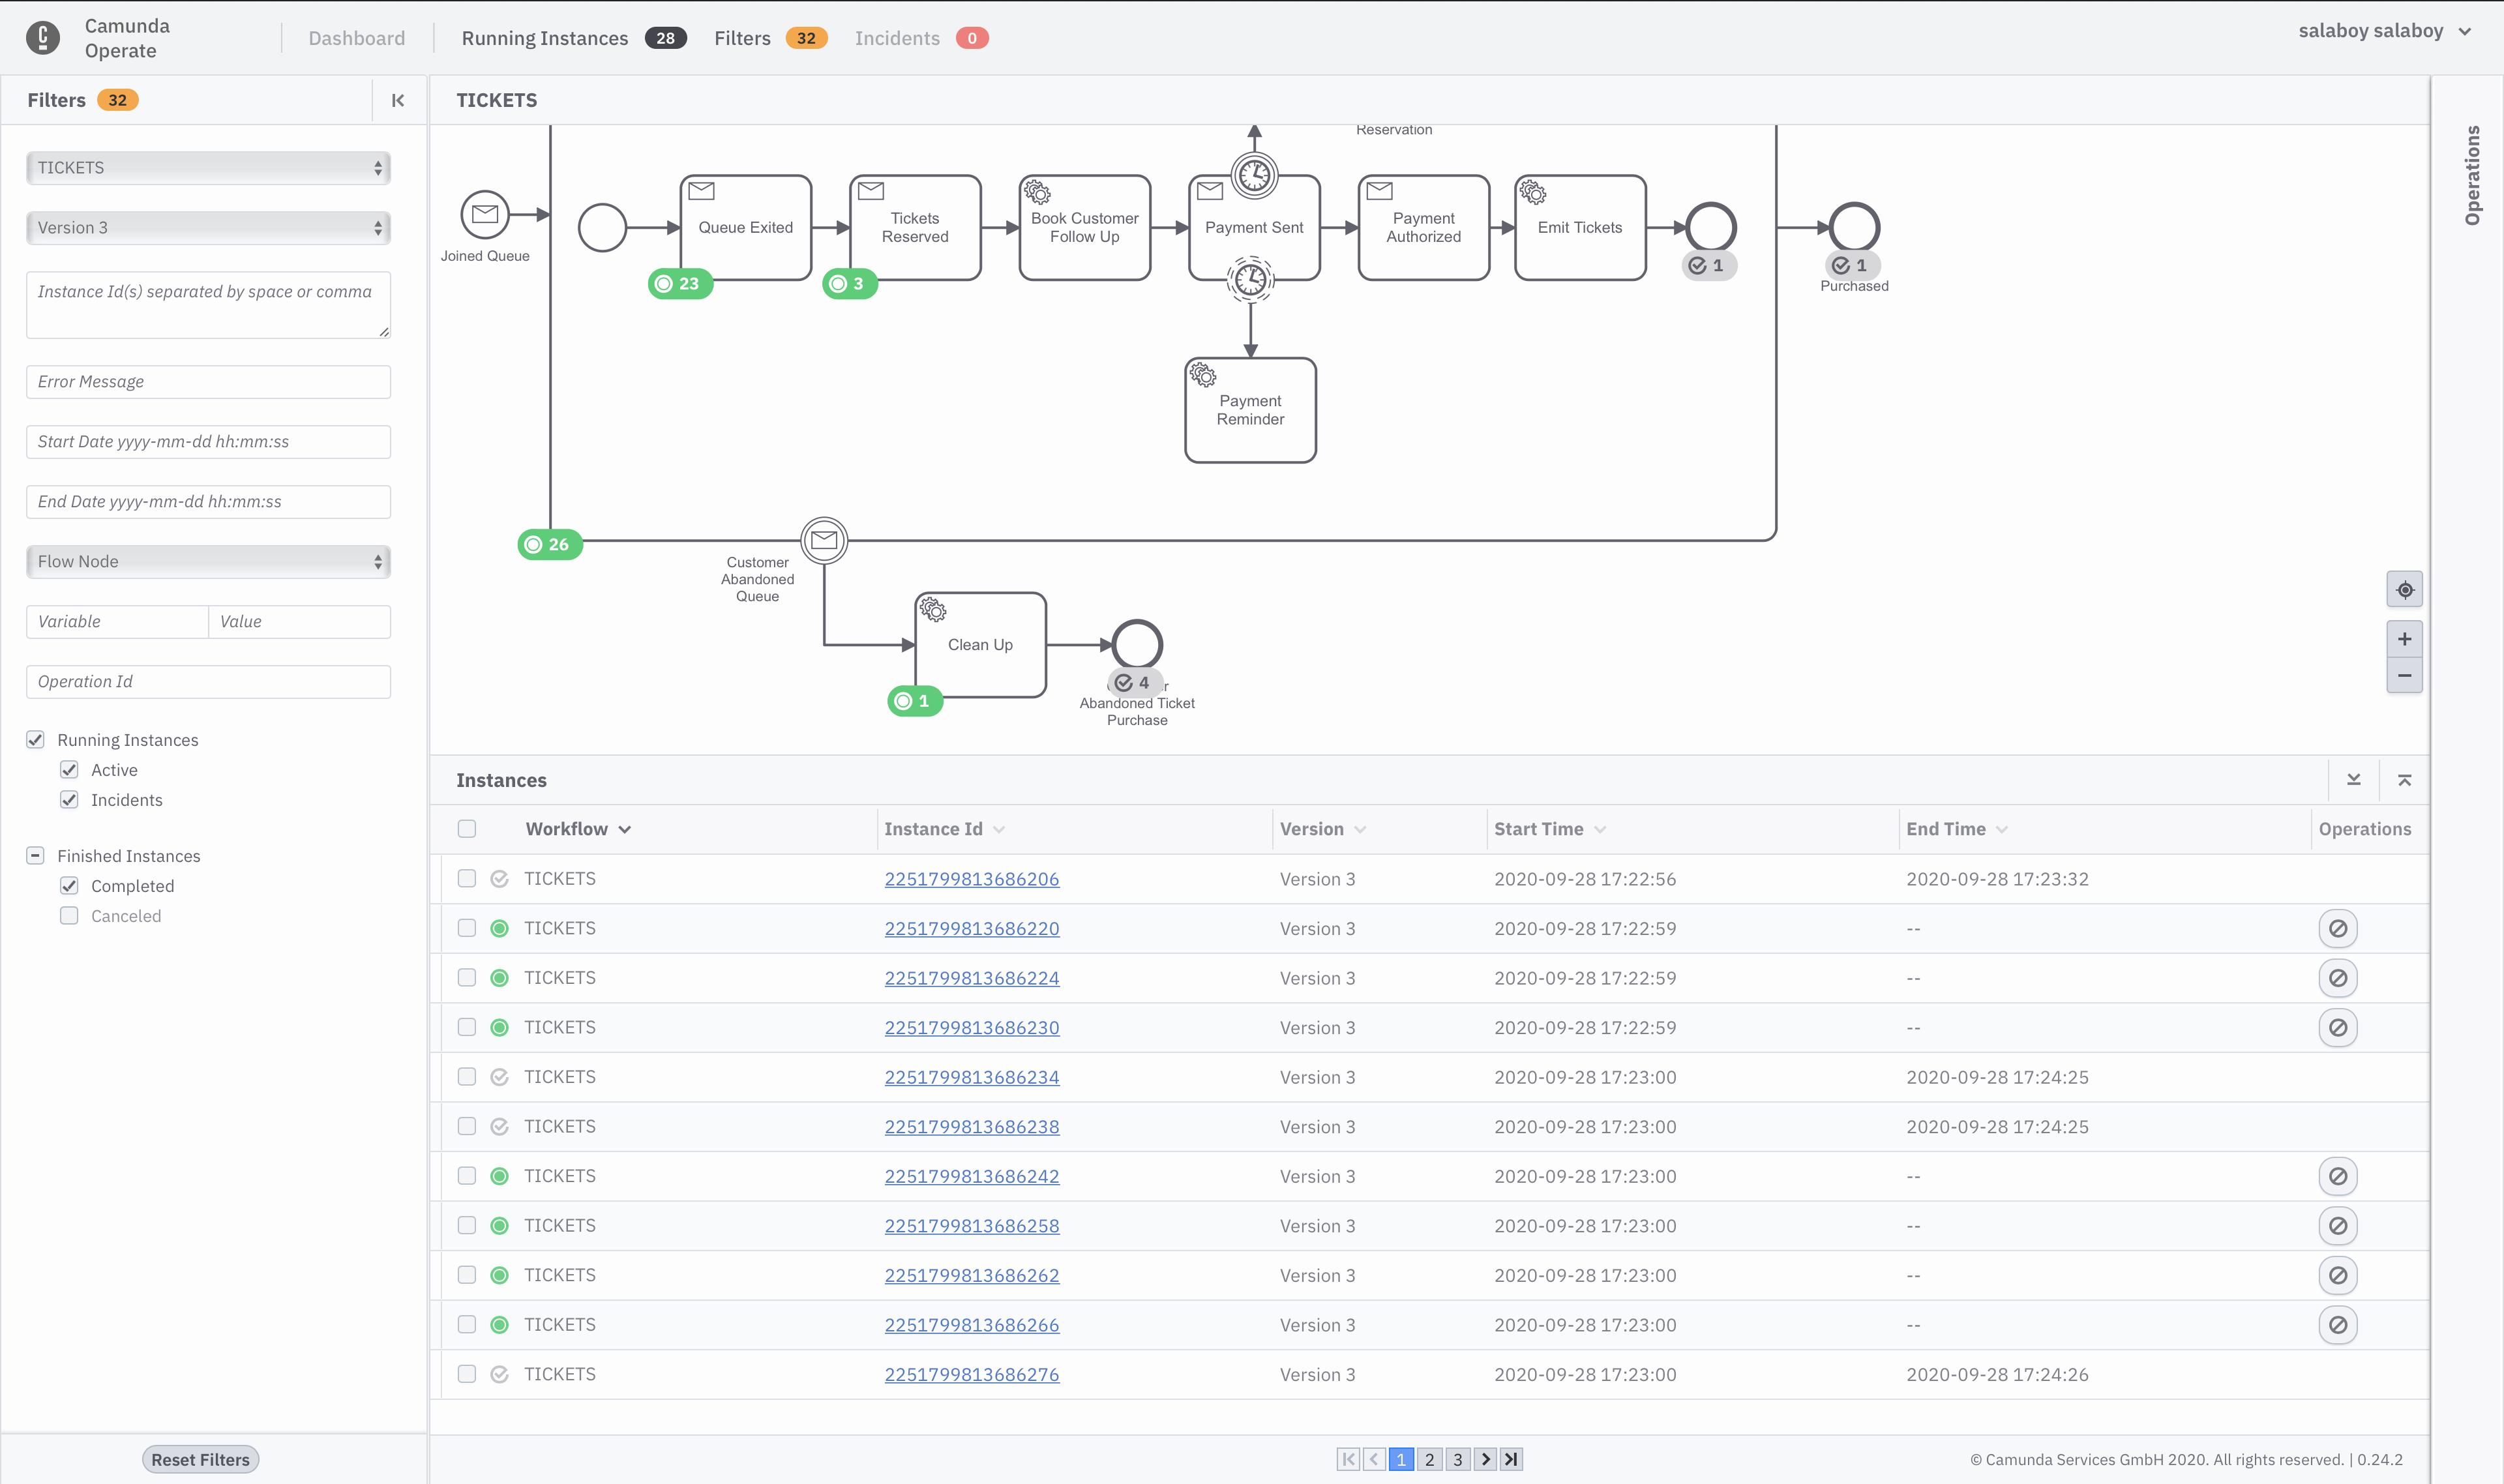 Workflow Model V3 in Operate